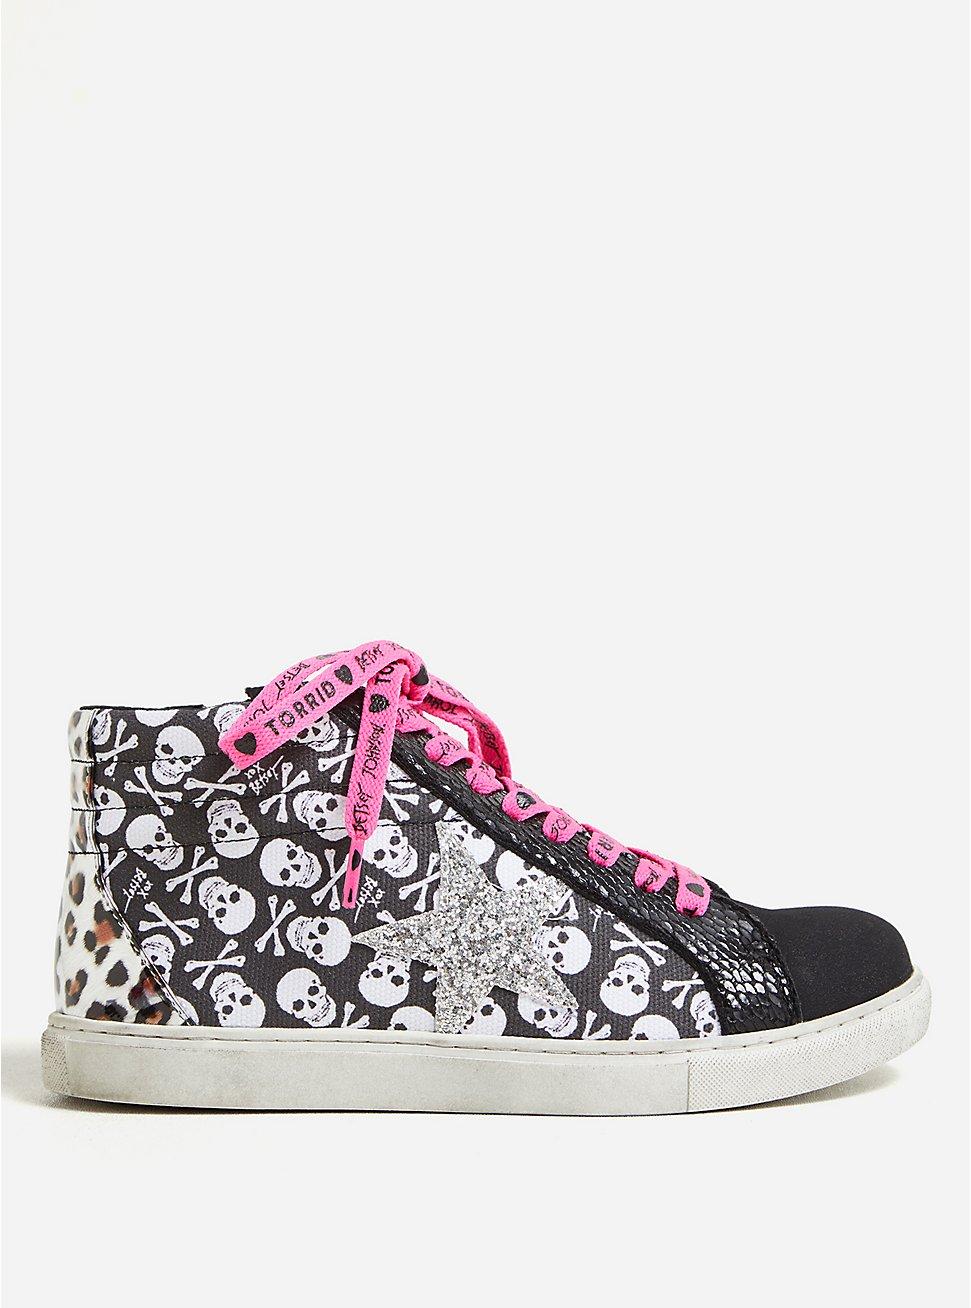 Betsey Johnson Black & White Skull Distressed High Top Sneaker (WW), BLACK, hi-res